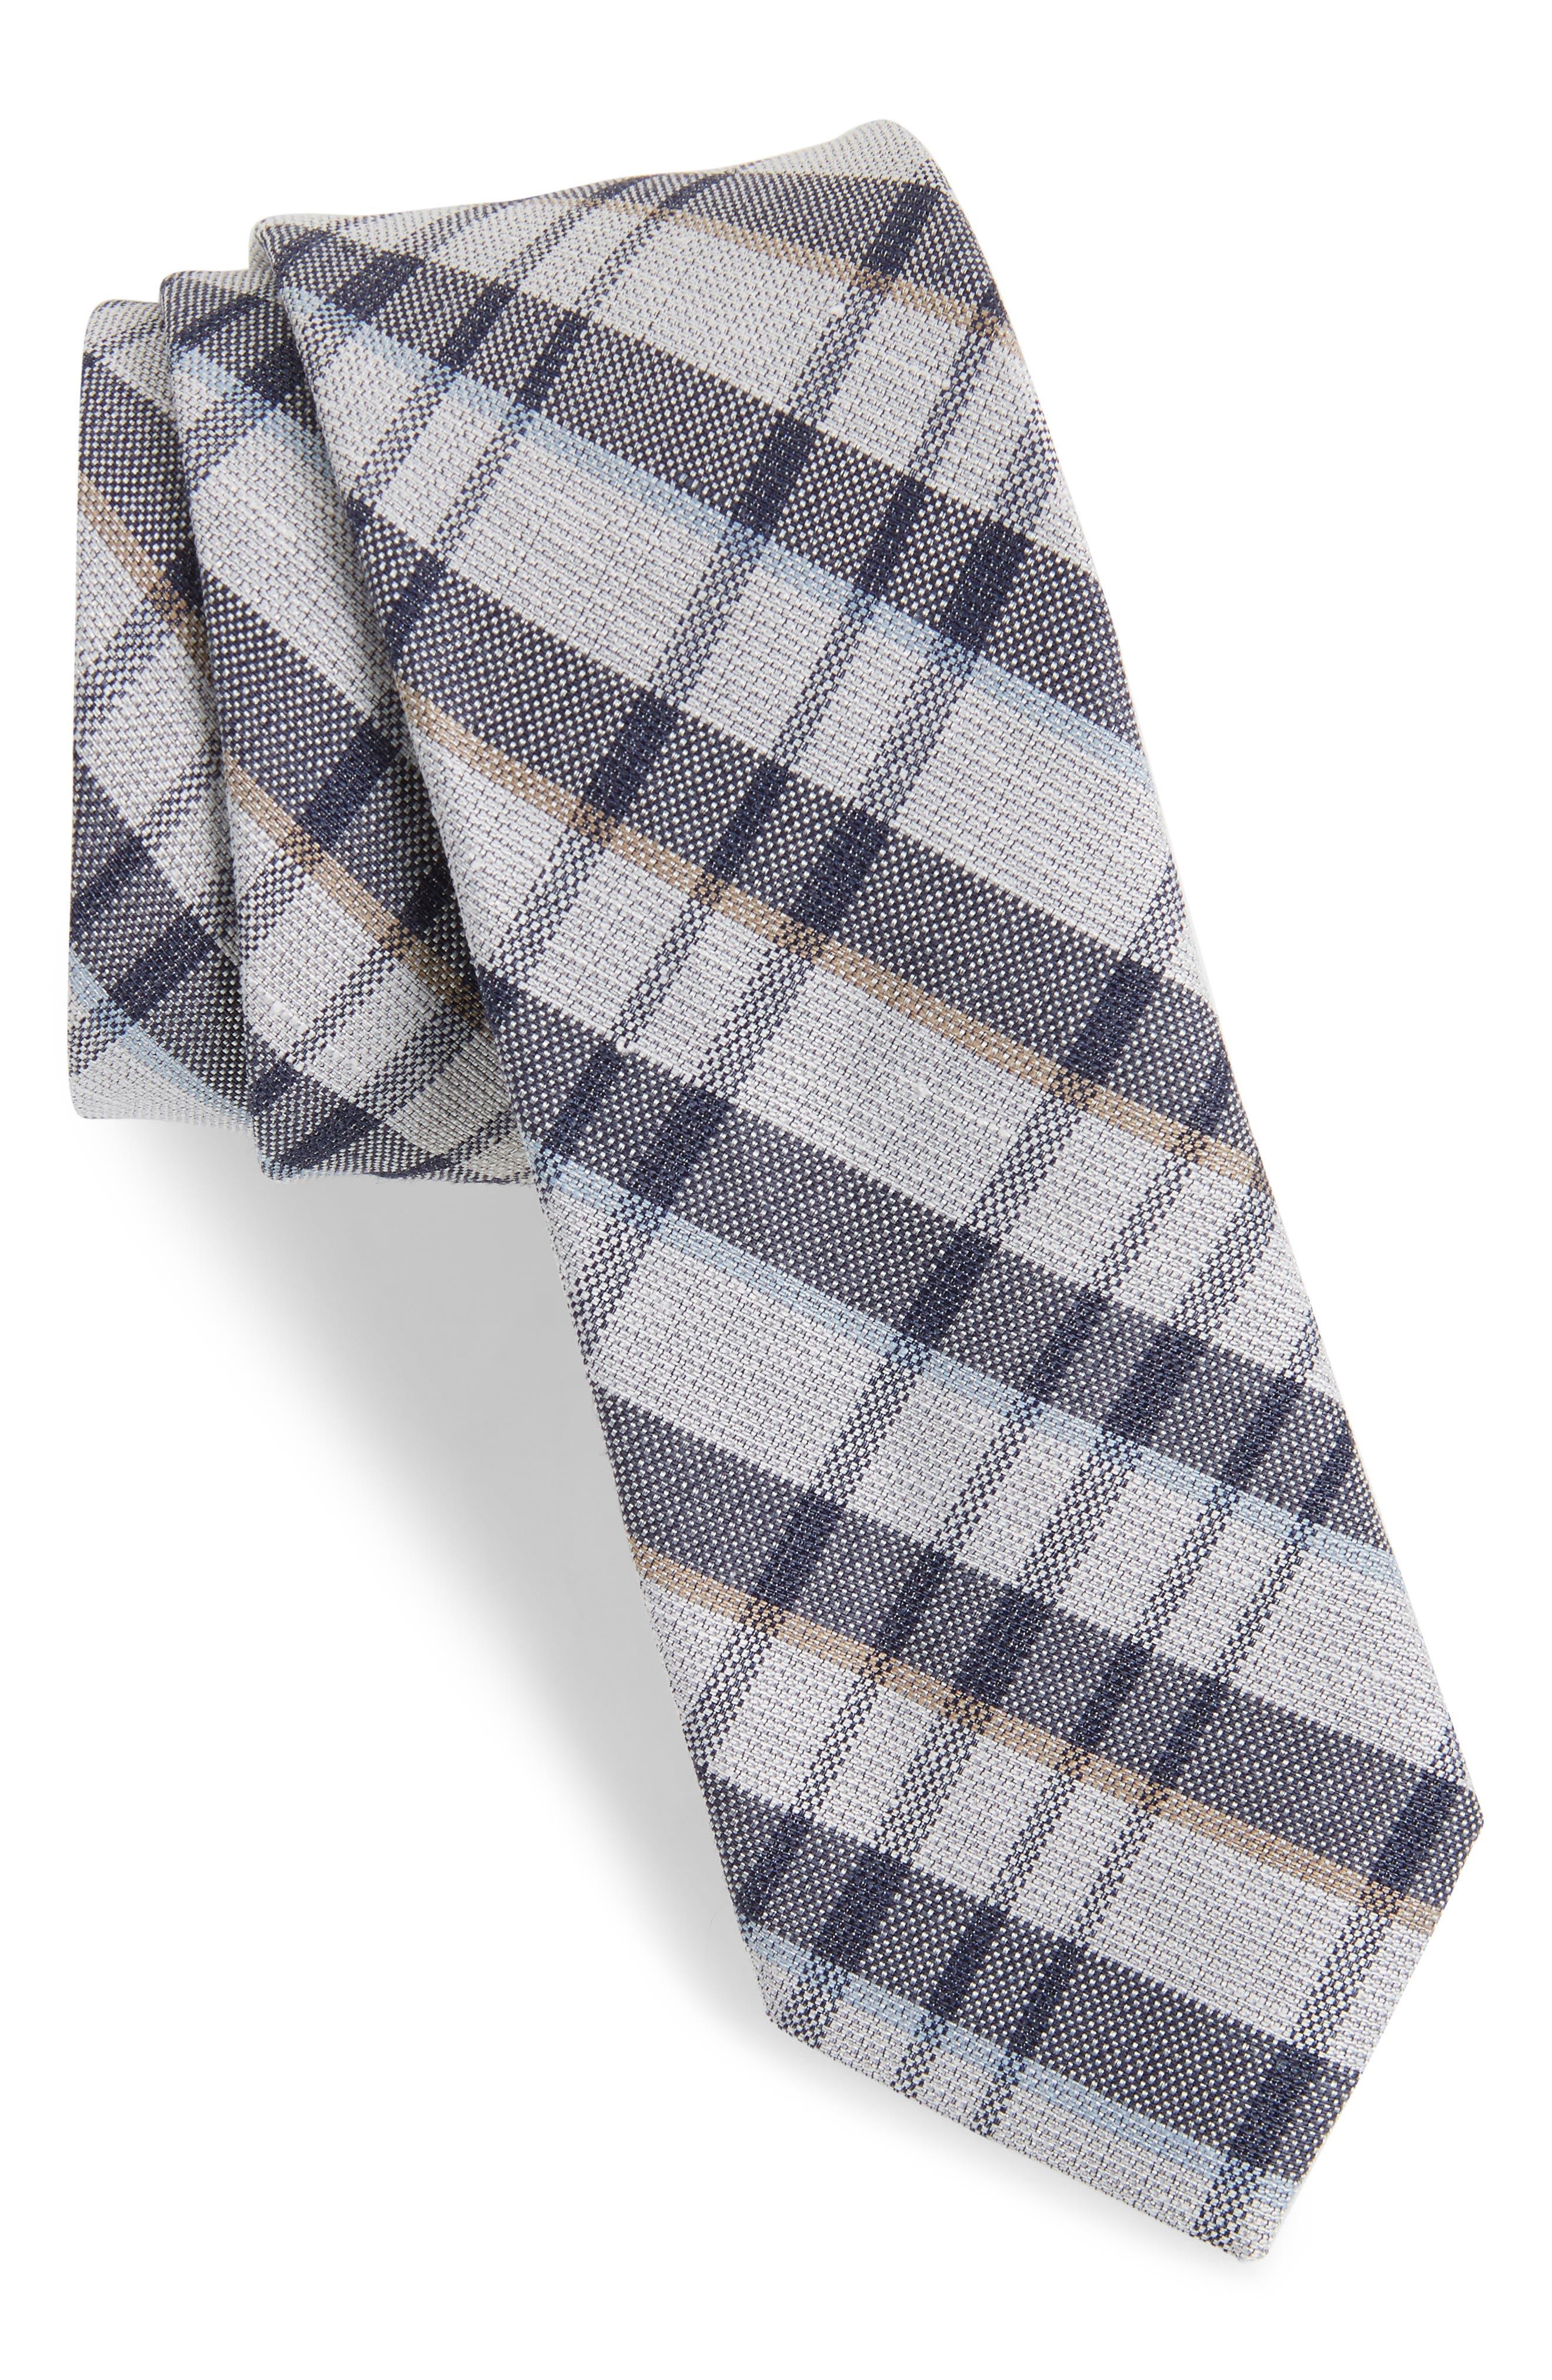 Duffy Plaid Linen & Silk Tie,                             Main thumbnail 1, color,                             410